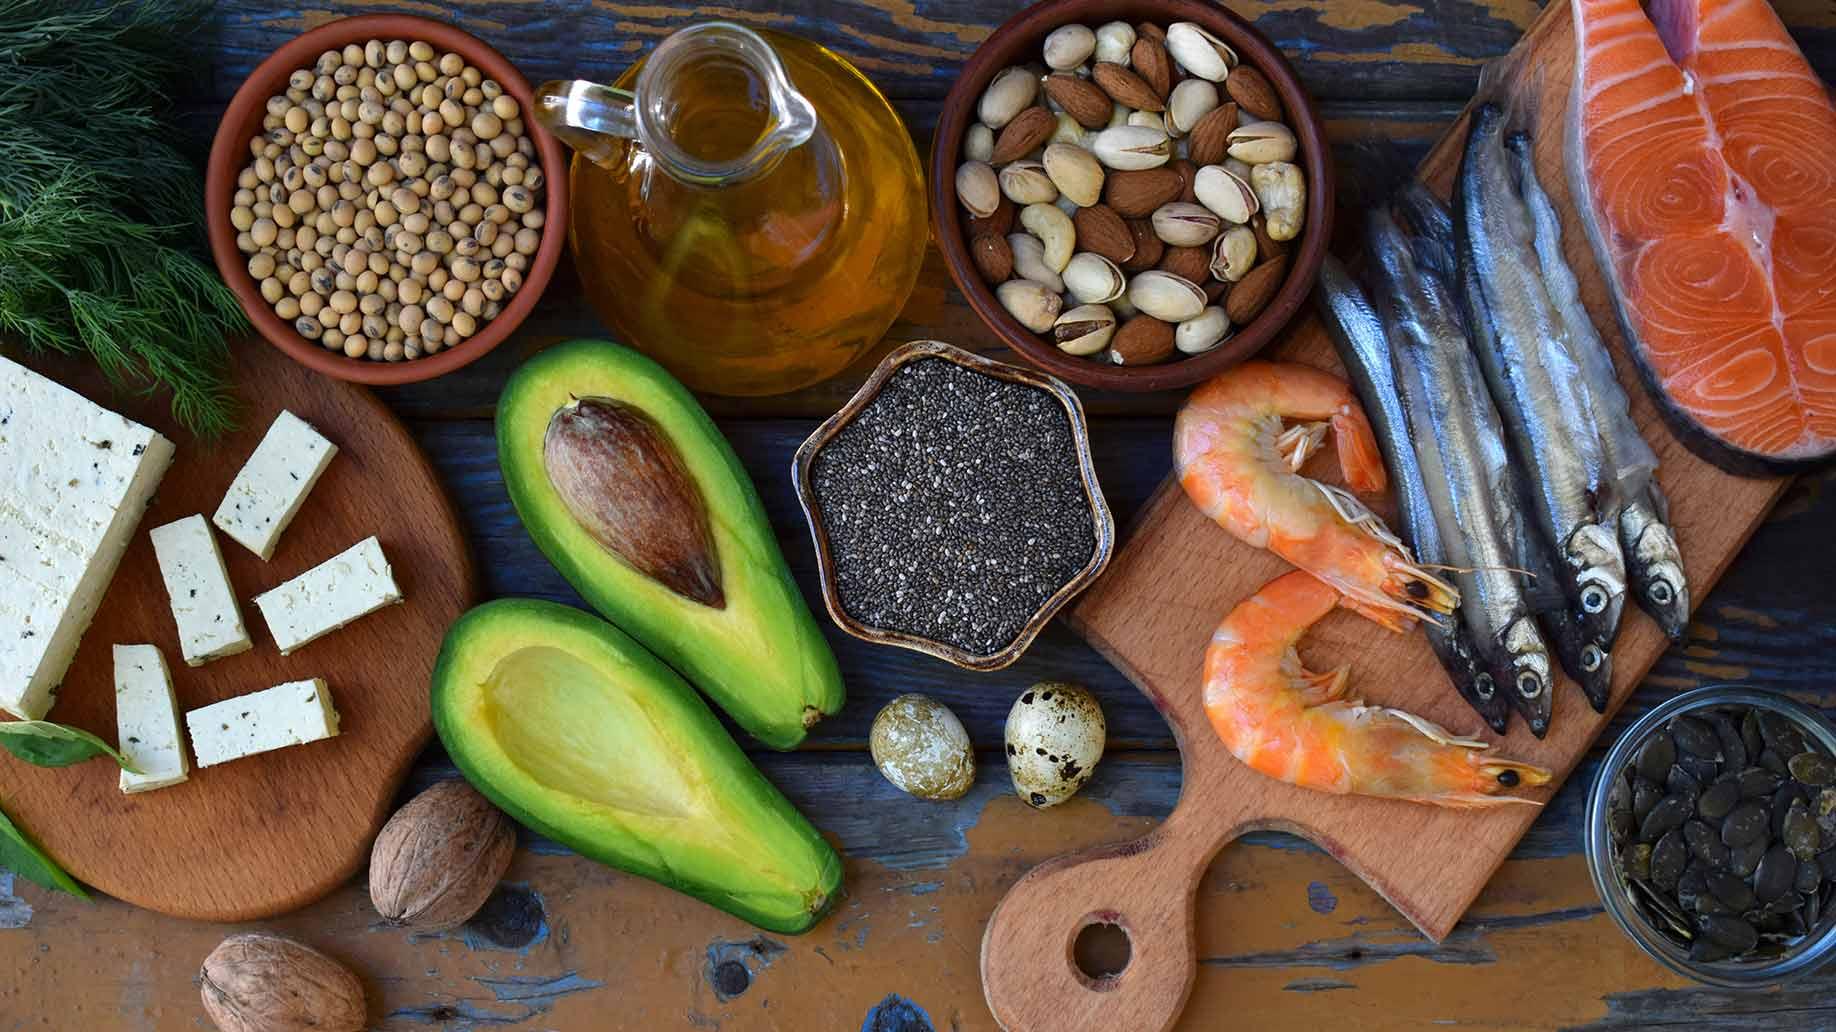 sardines avocado shrimp nuts tofu omega 3 fatty acid fish oil diabetes prediabetes natural remedies